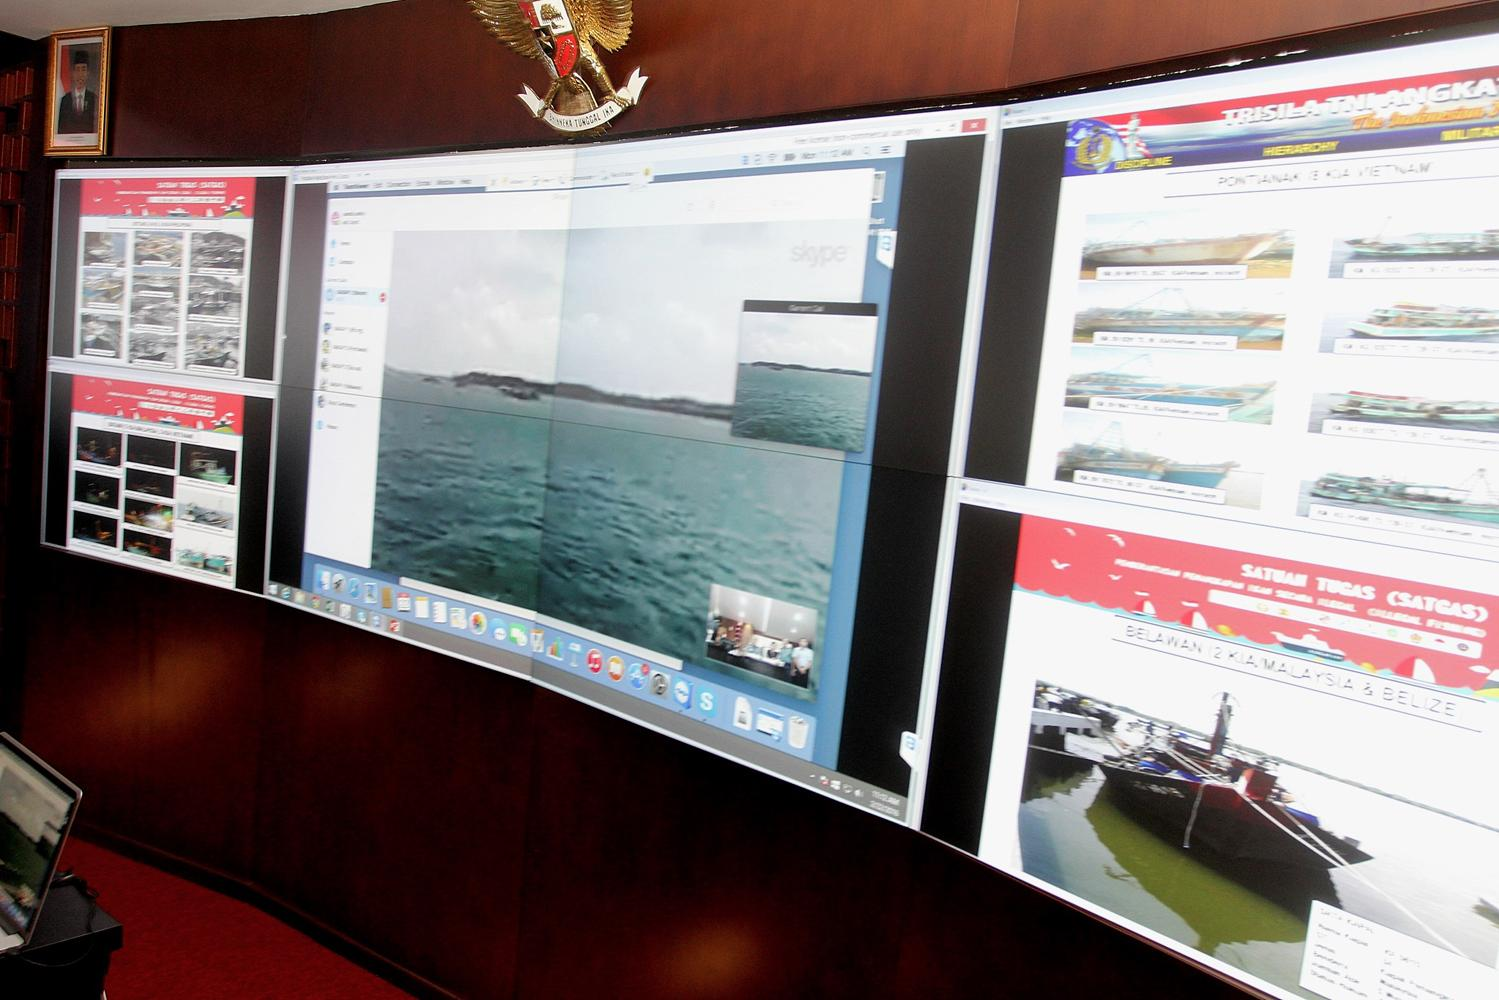 Tampak dilayar, kapal-kapal yang akan ditenggelamkan oleh Menteri Kelautan dan Perikanan, Susi Pudjiastuti, dengan memimpin secara langsung melalui video live streaming, penenggelaman 31 kapal IUUF di lima titik daerah berbeda, Senin, (22/02).